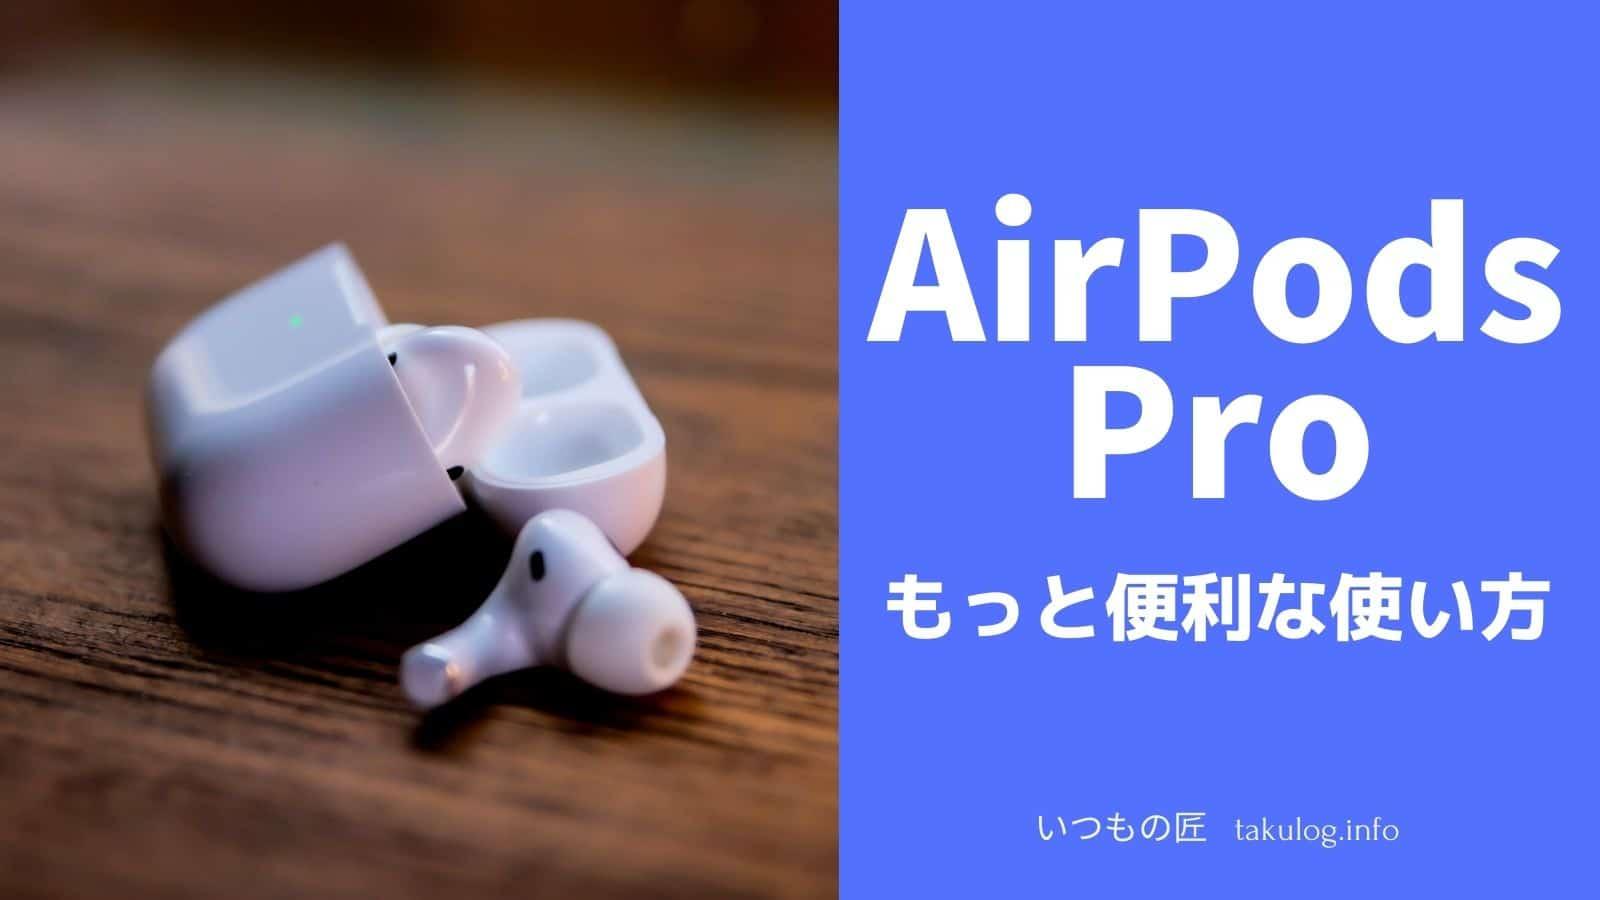 AirPods / AirPods Proをもっと活用できるようになる記事